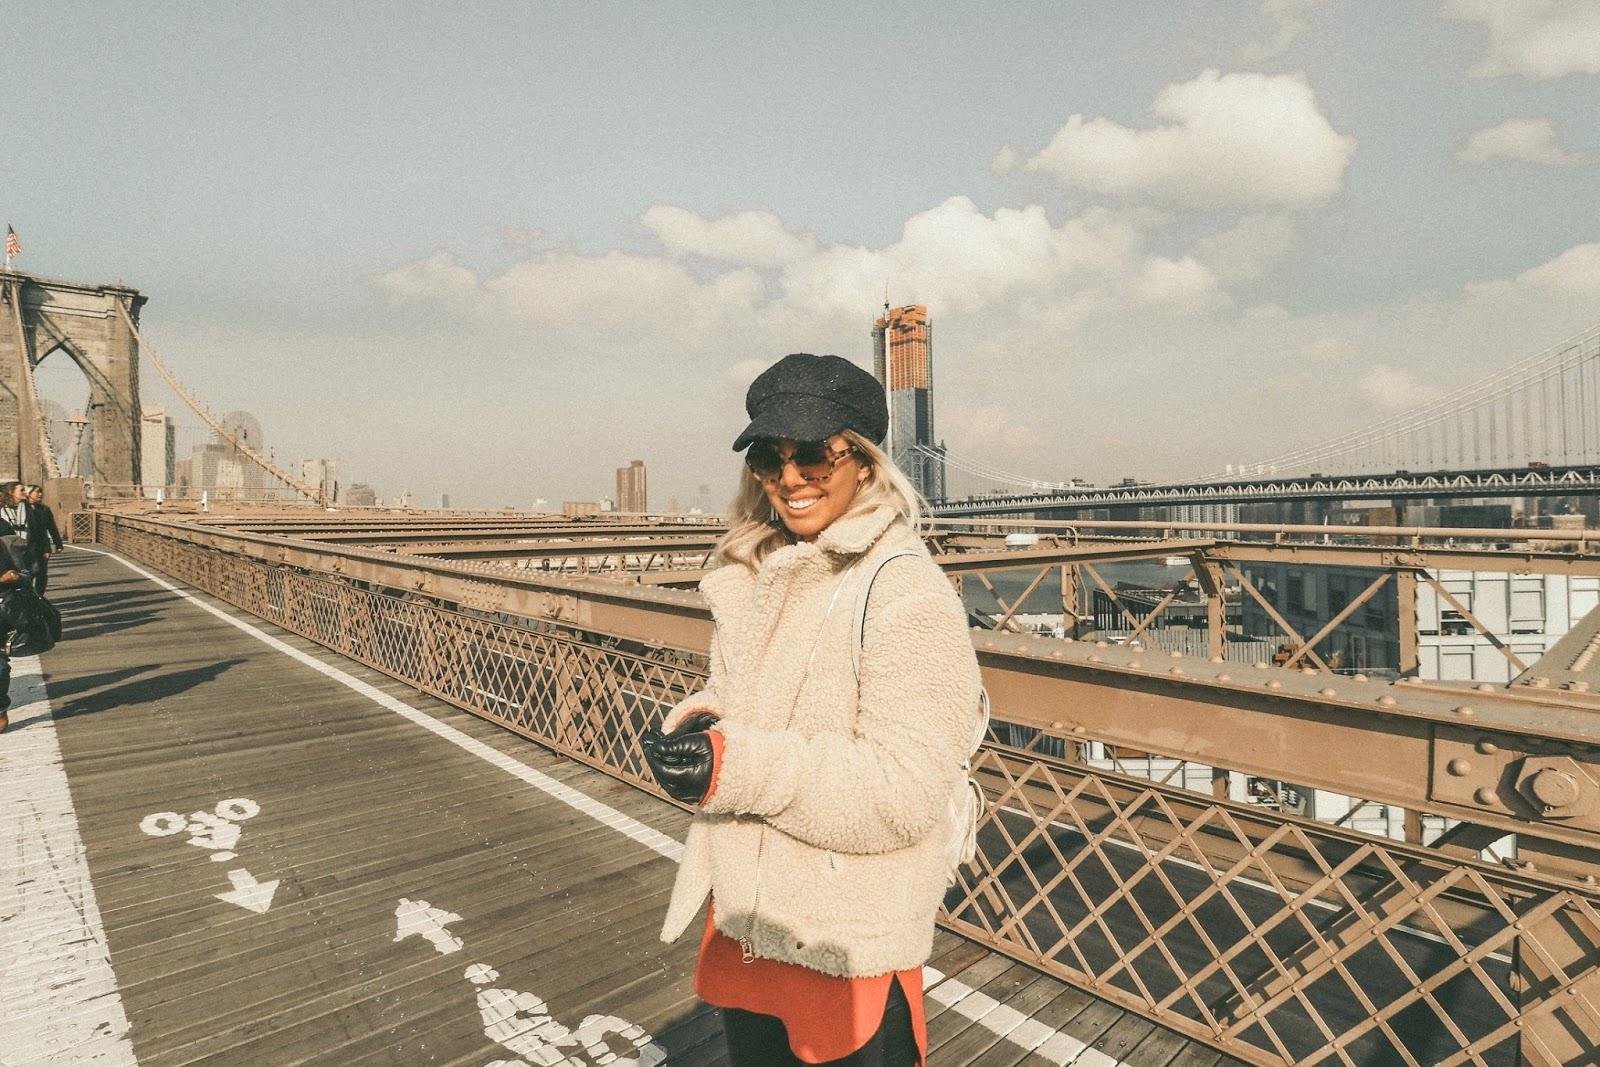 Brooklyn Bridge winter outfit lightroom presets